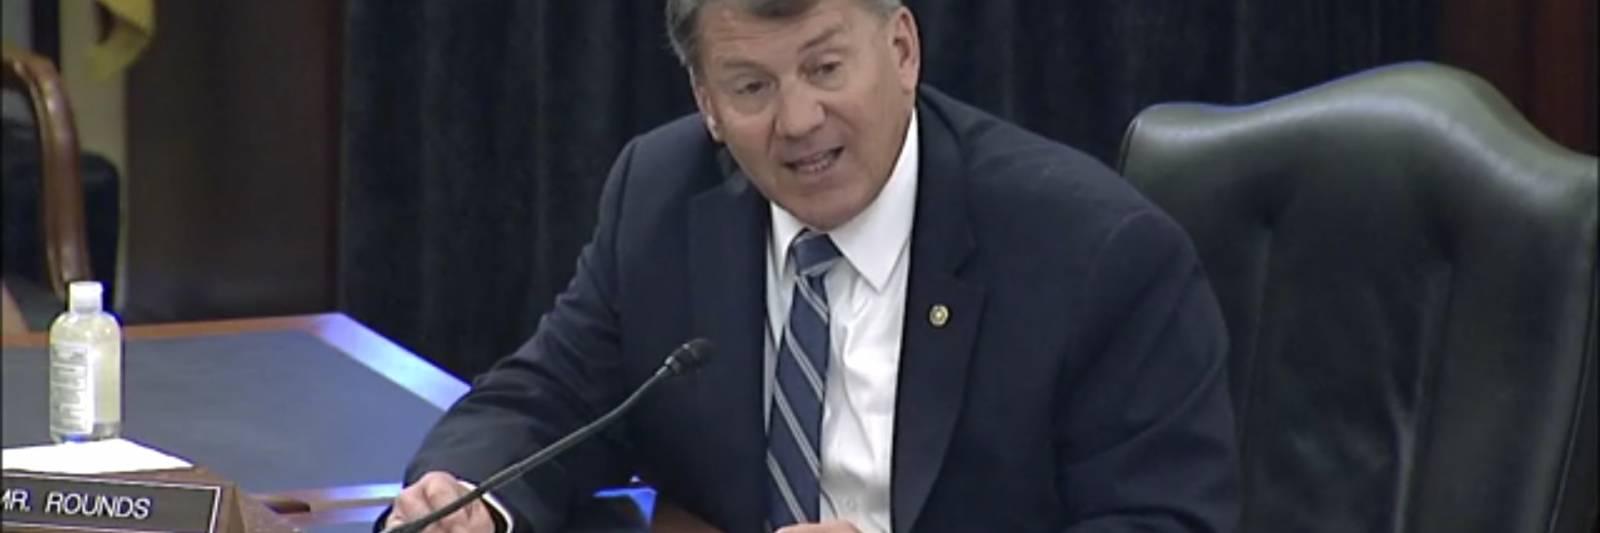 senator: is it time to treat ransomware like piracy, using